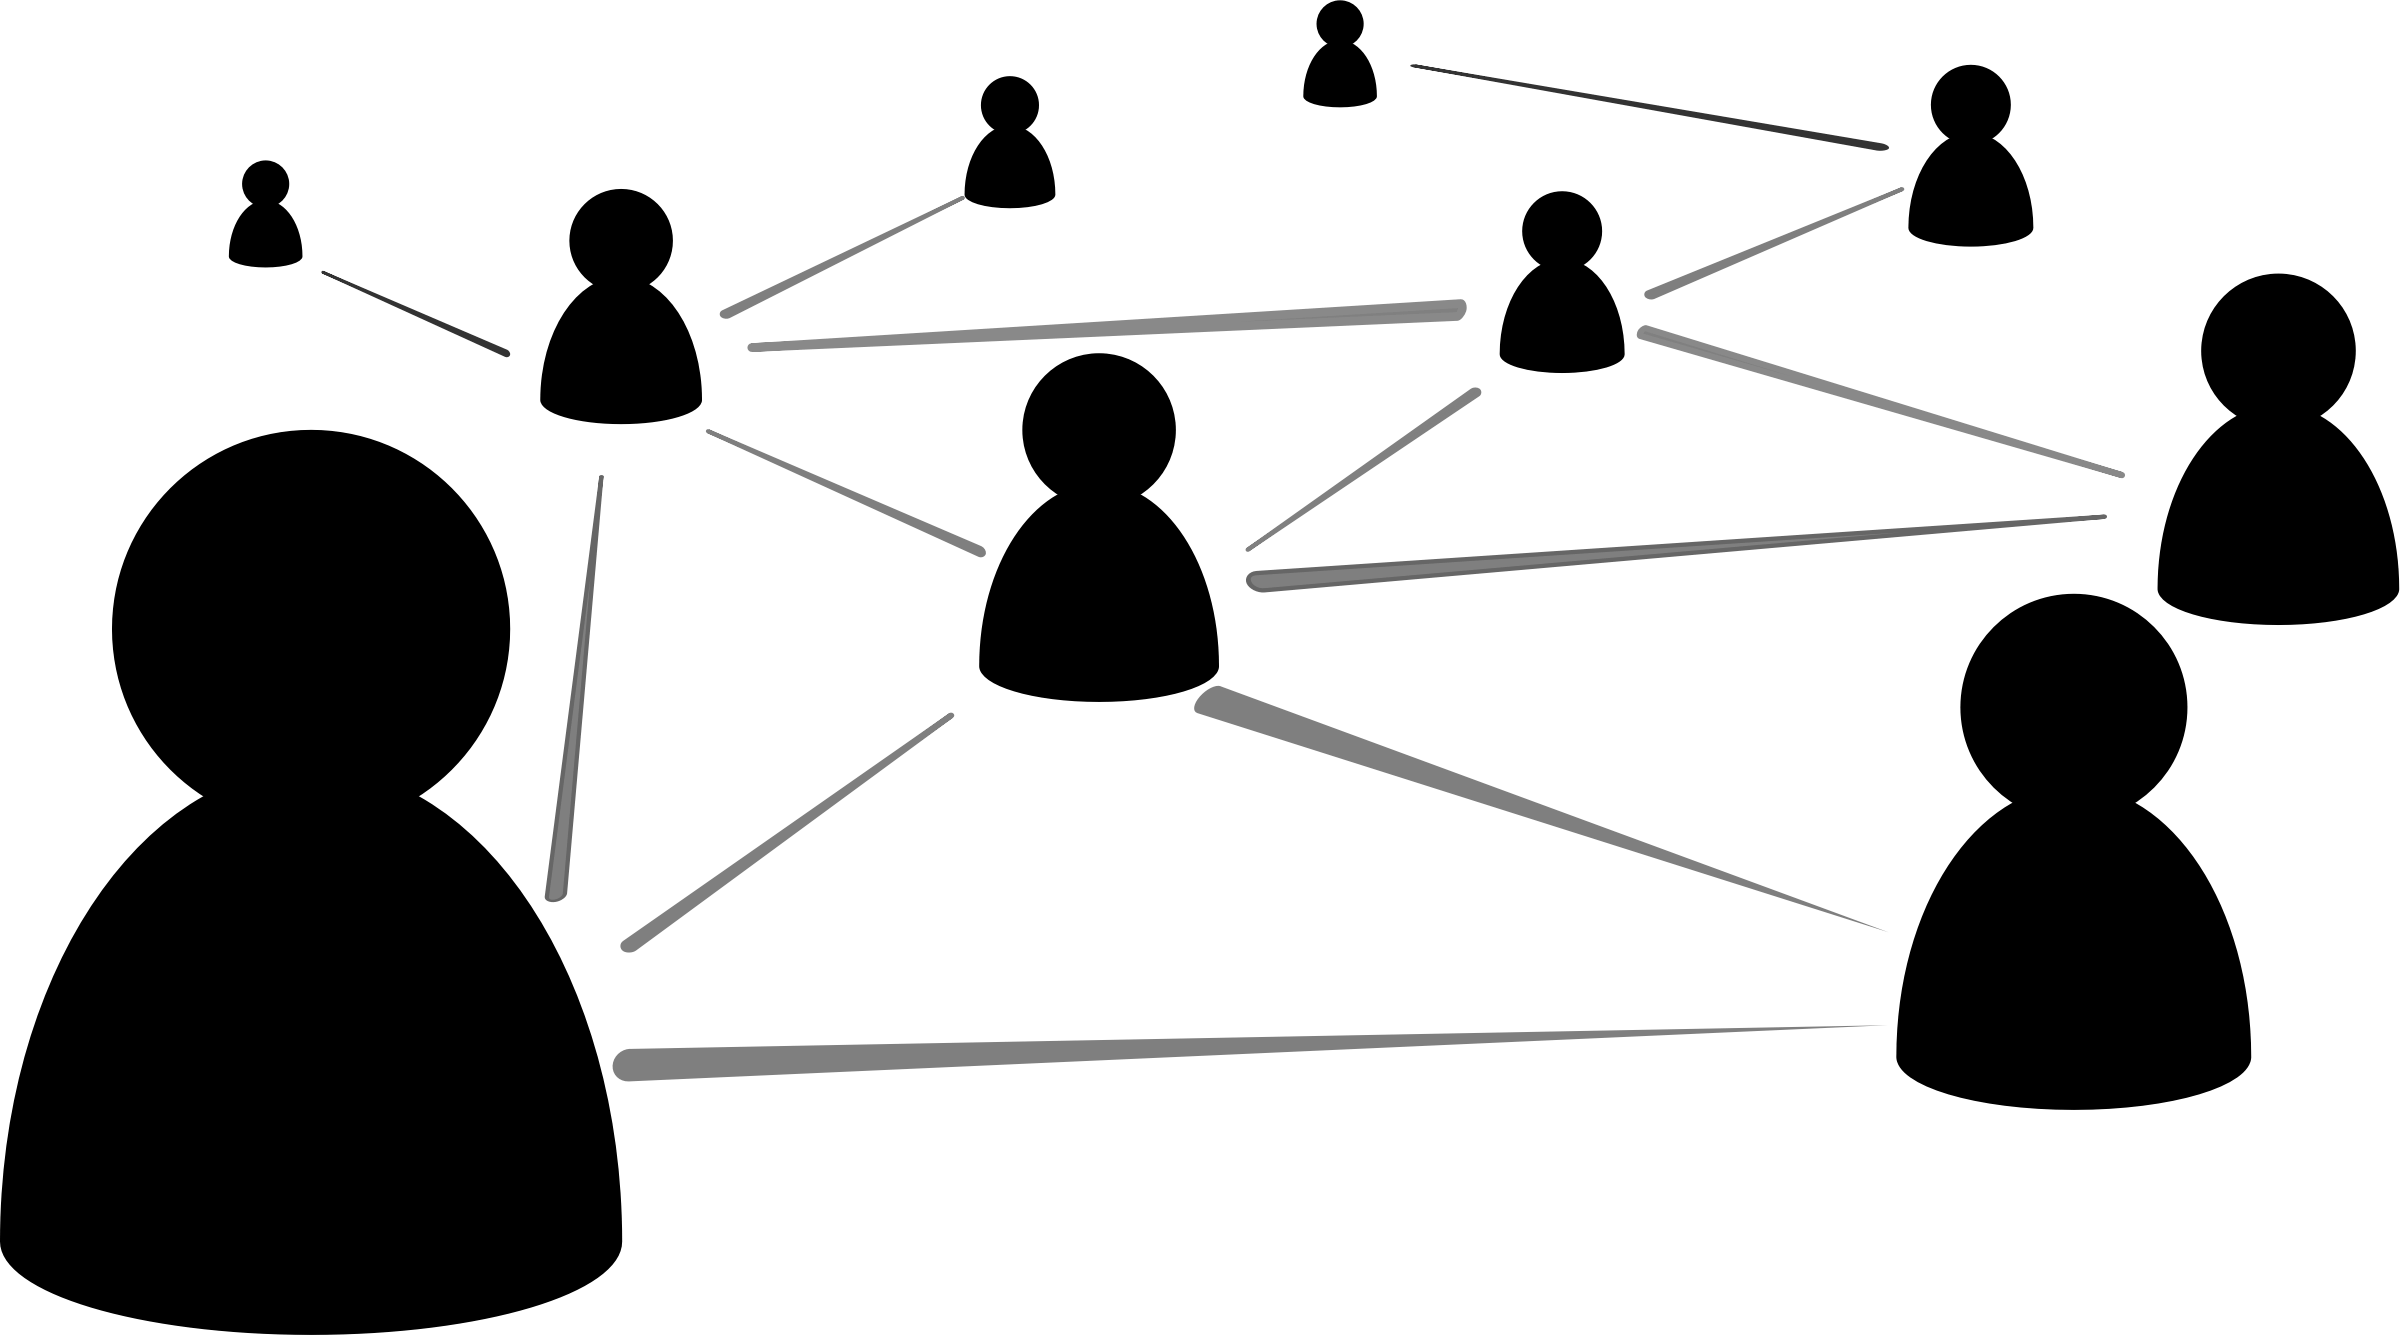 Network clipart network icon, Network network icon